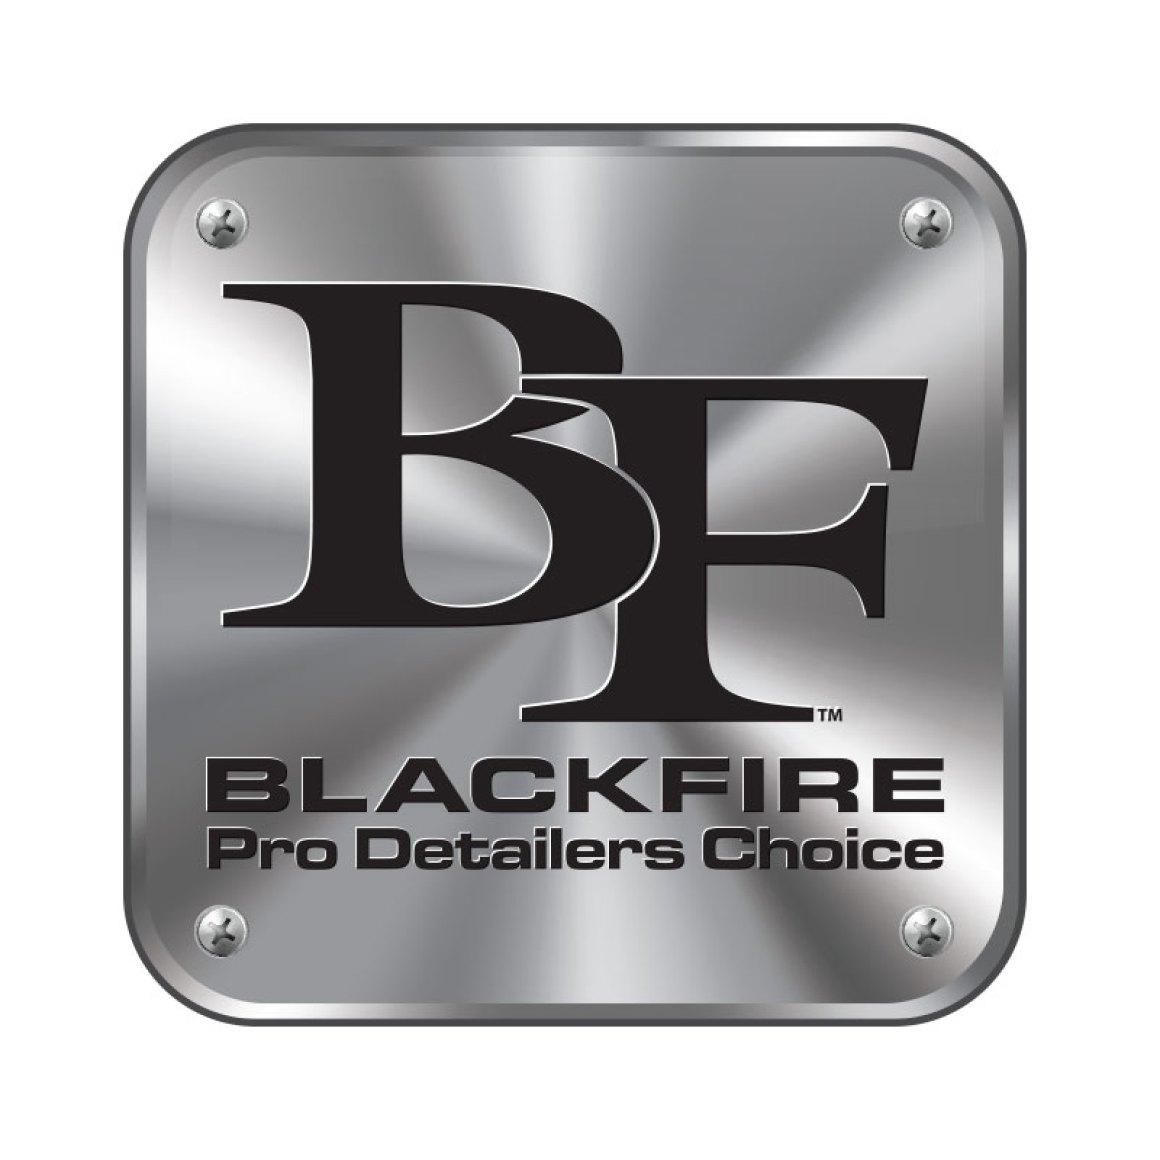 blackfire-blackice-whiplash-mini-wax-kit-21.gif